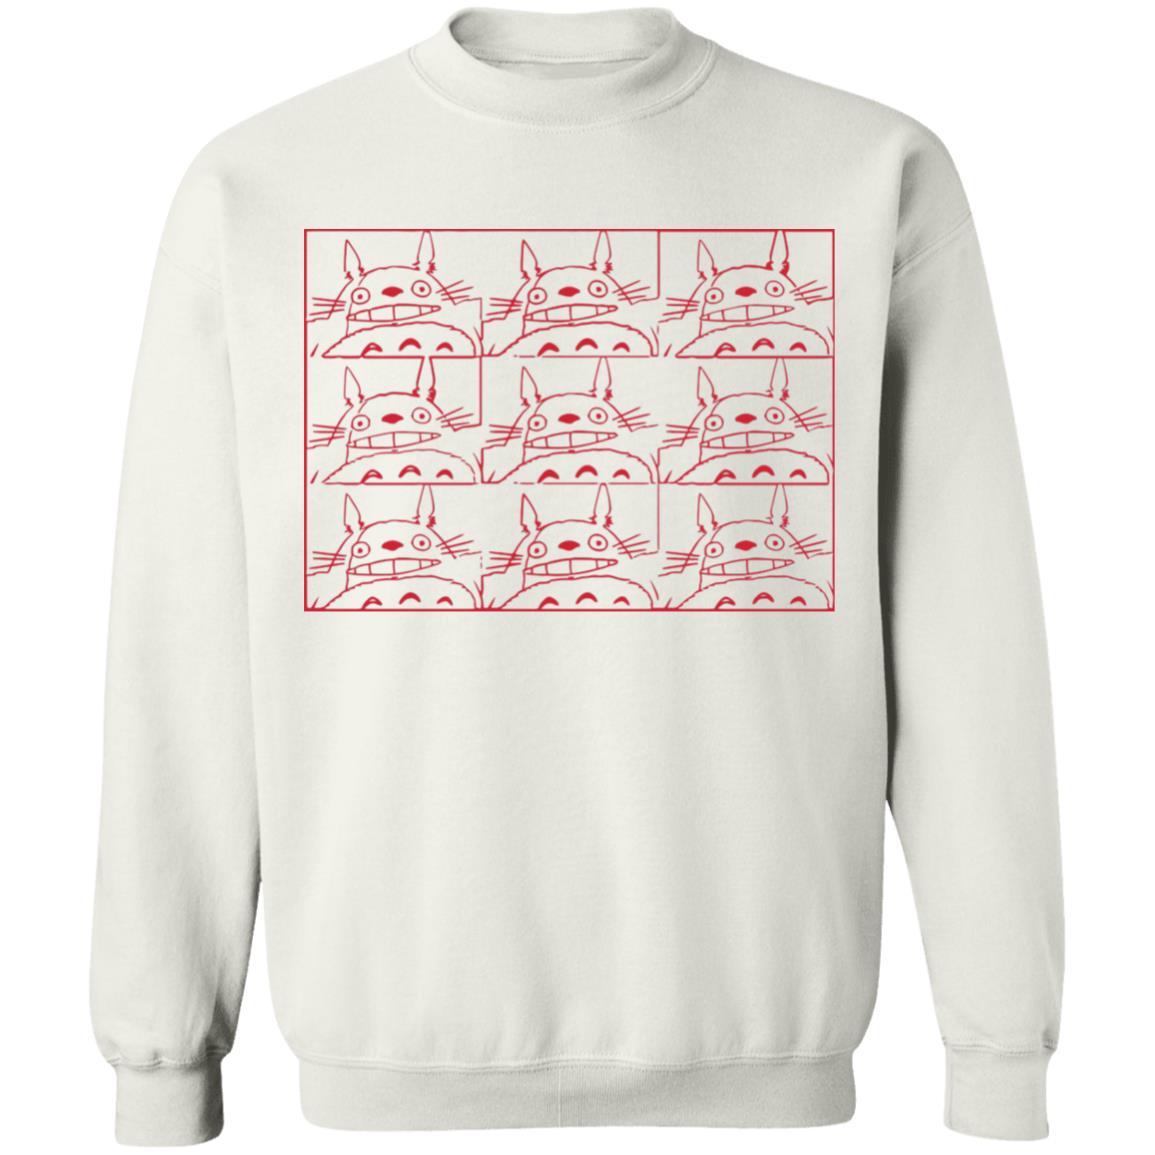 My Neighbor Totoro Neon Collage Art Sweatshirt